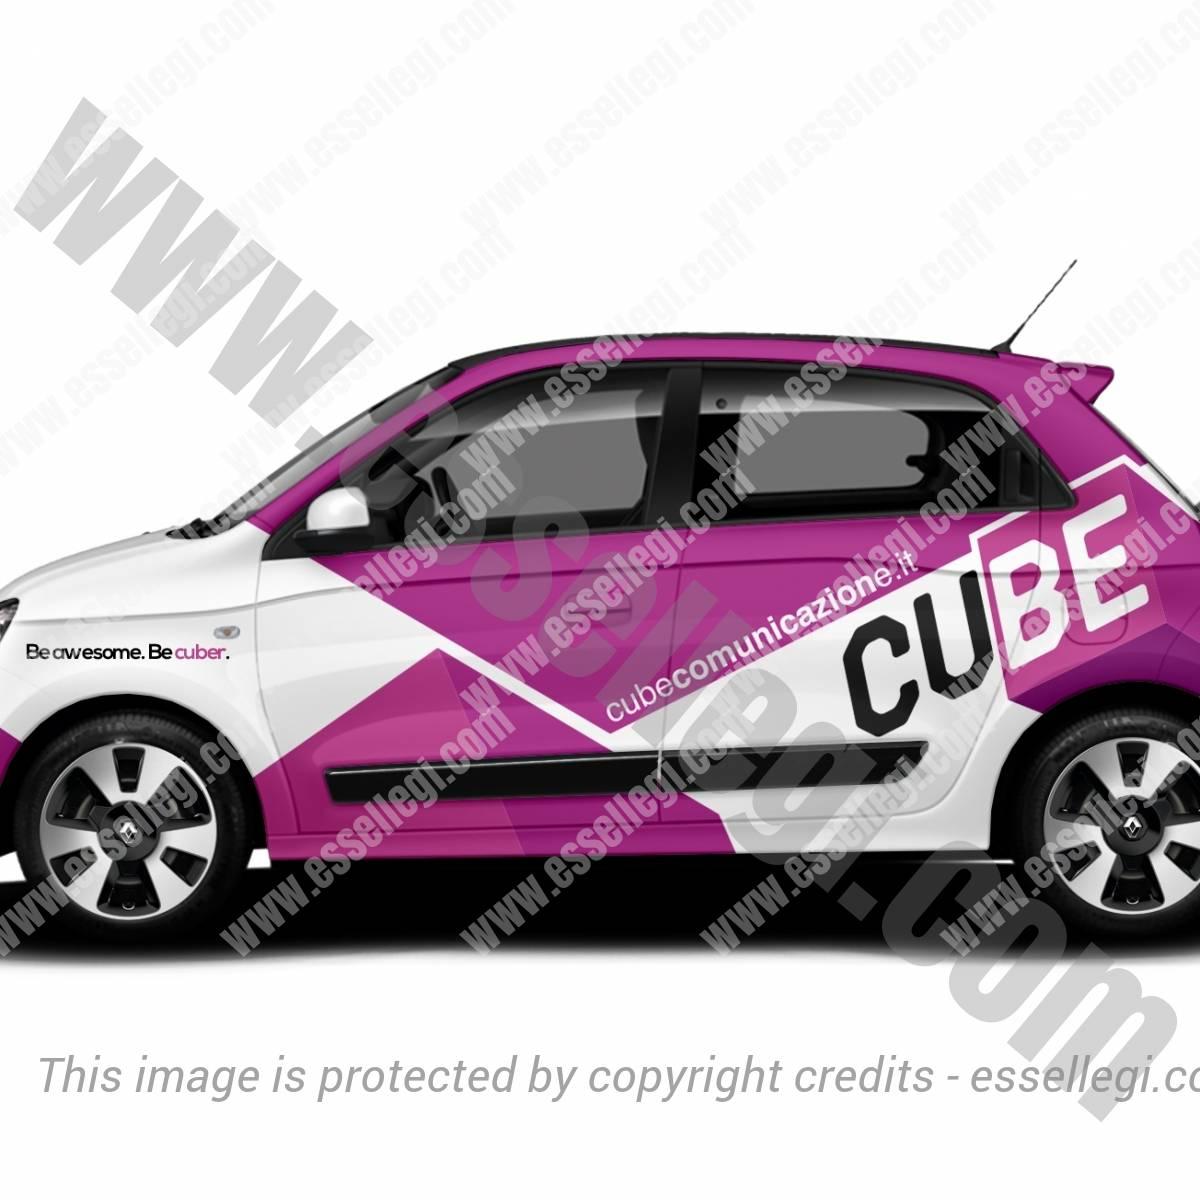 CUBE COMUNICAZIONE | CAR WRAP DESIGN 🇮🇹